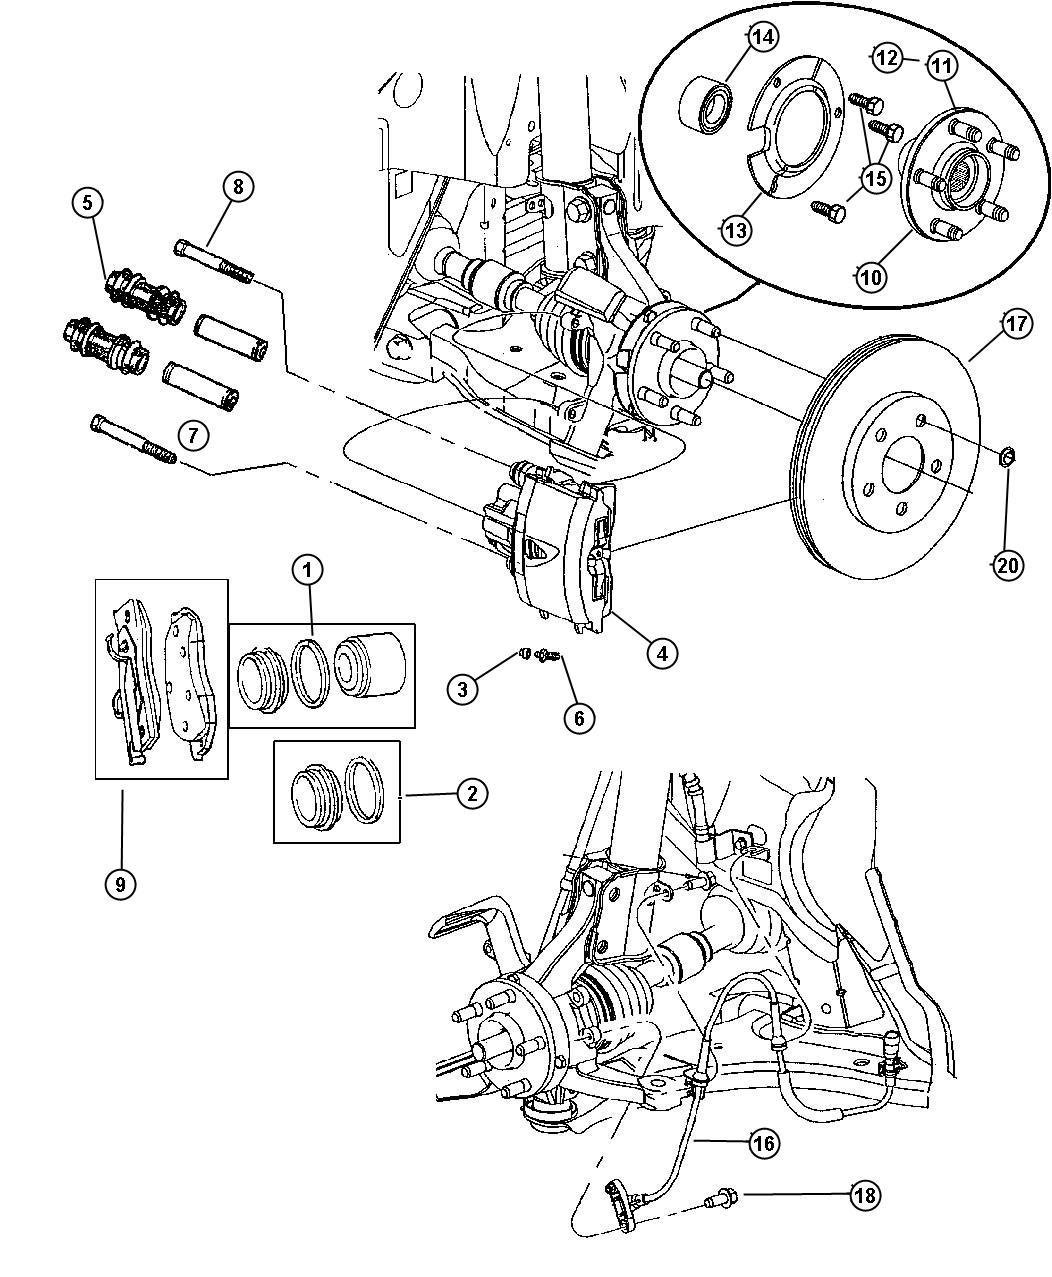 Dodge Neon Bolt Hex Flange Head M8 1 25x68 50 Mounting